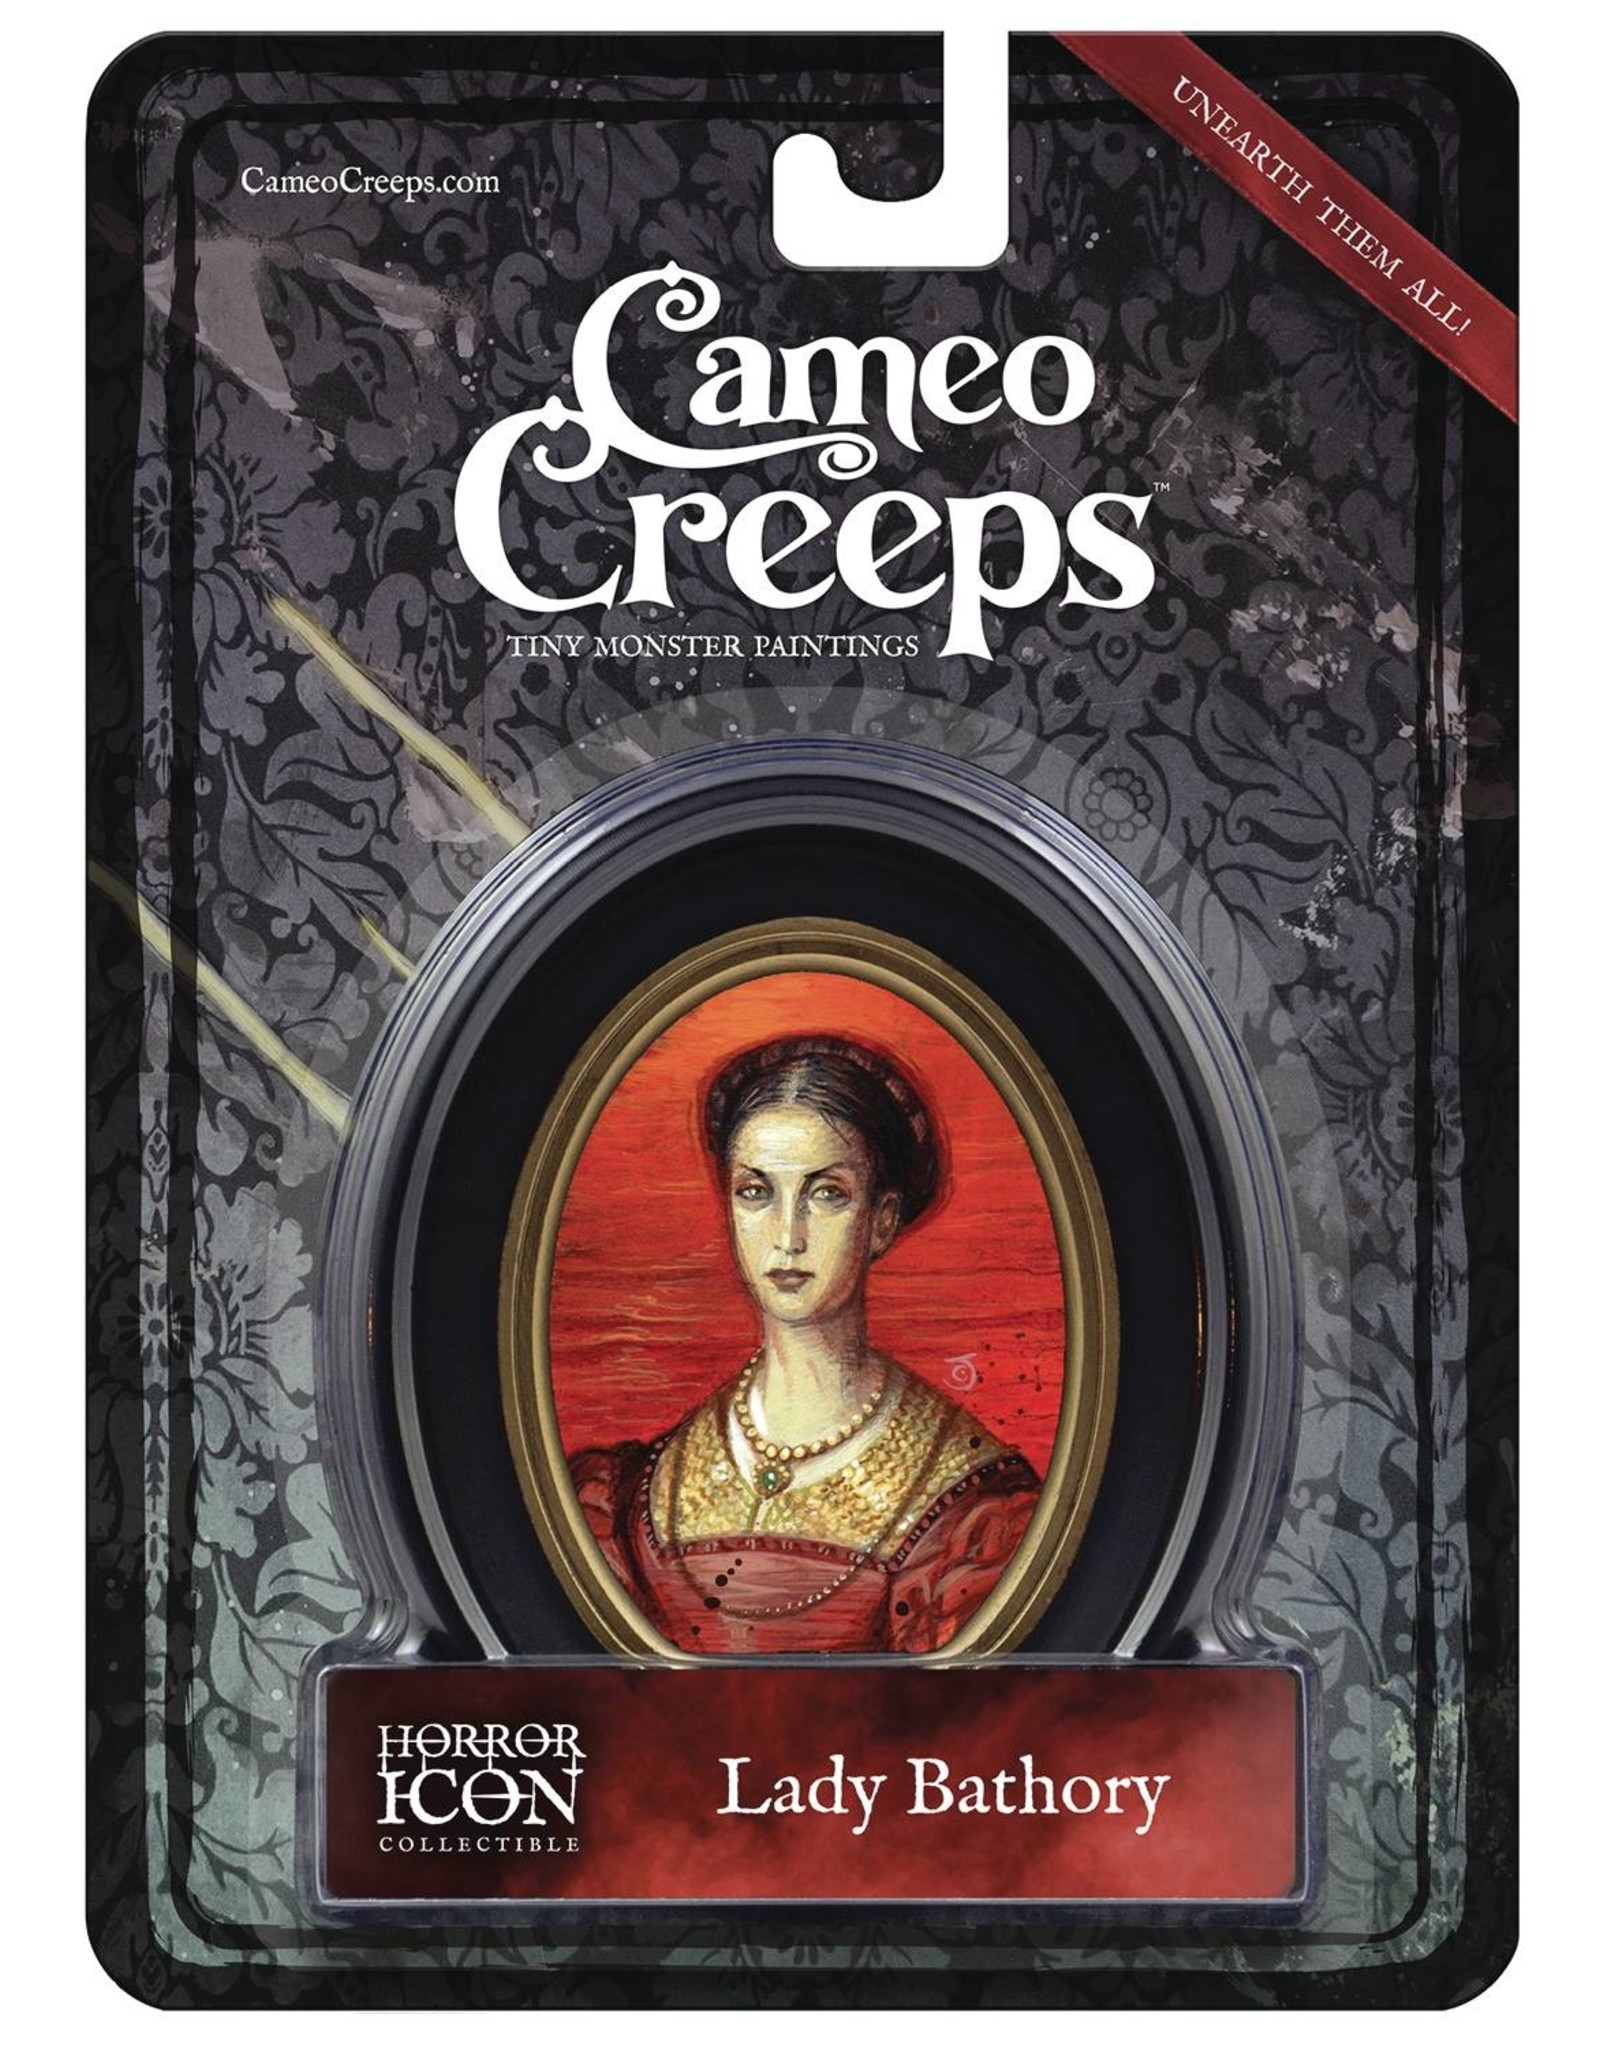 CAMEOCREEPS LADY BATHORY MINI CAMEO PORTRAIT